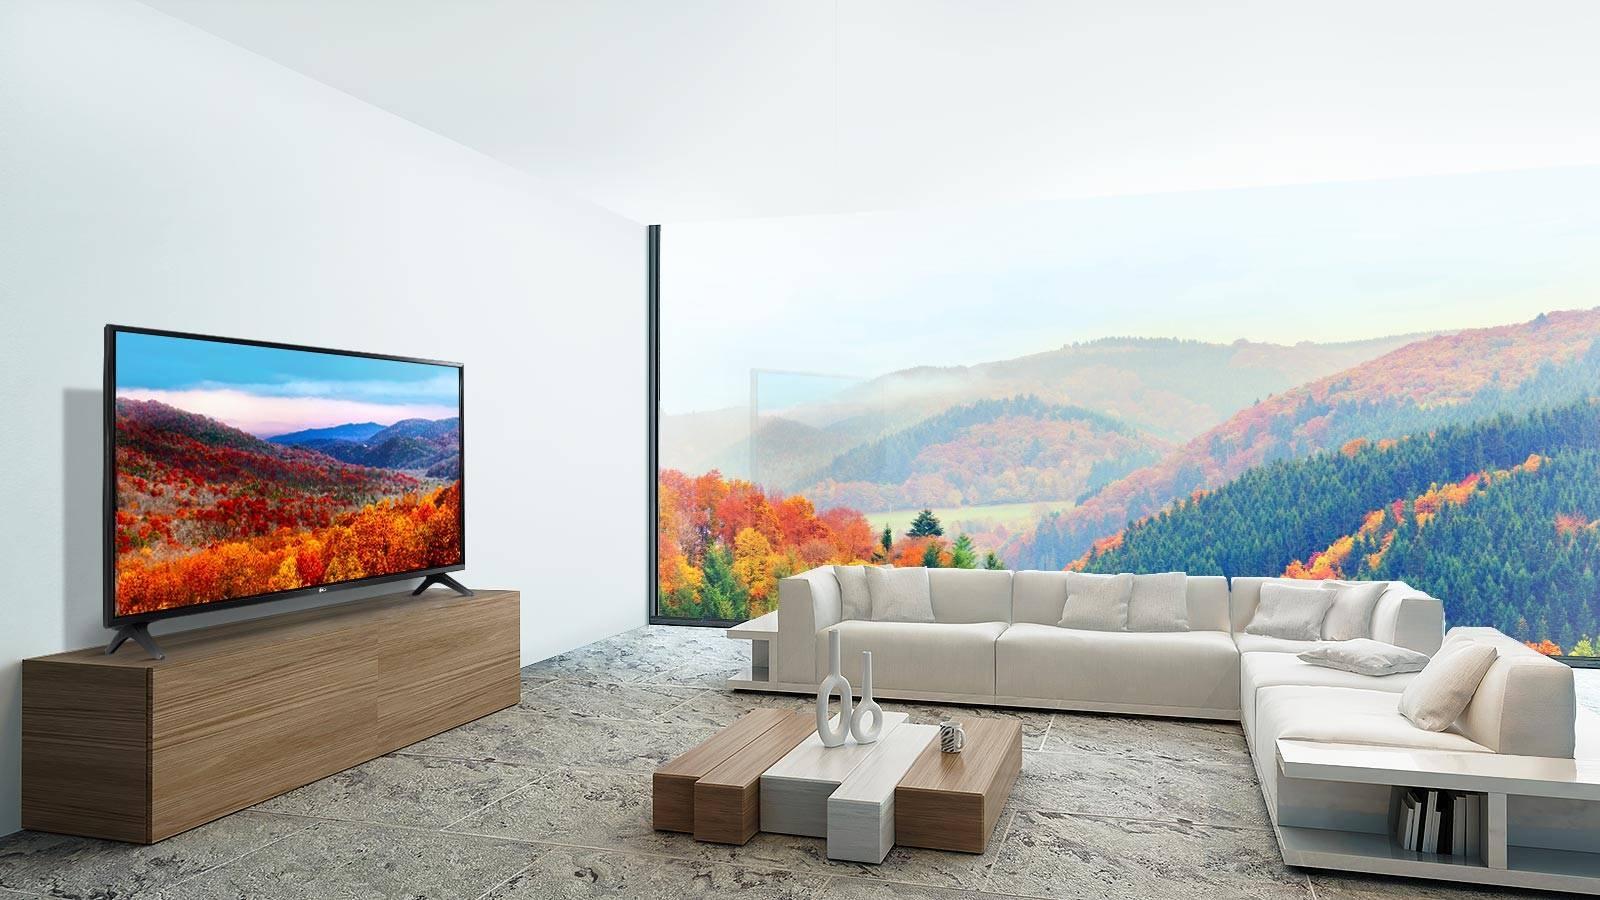 32LK500BPTA  LED TV  prix maroc